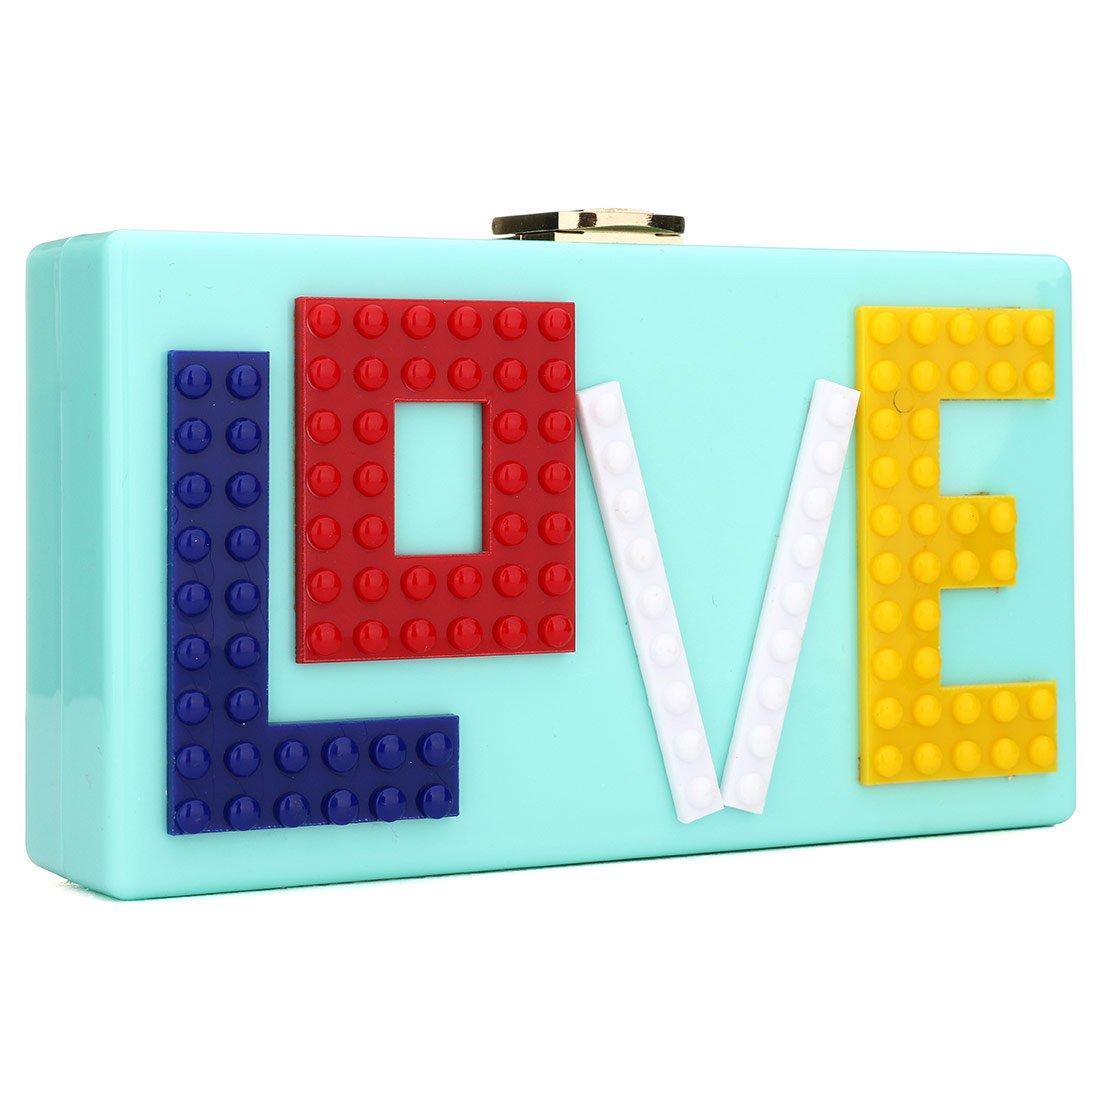 Love Acrylic Clutch Evening Bag Purse Handbag for Women Ladies Ideal Gift (Cyan)